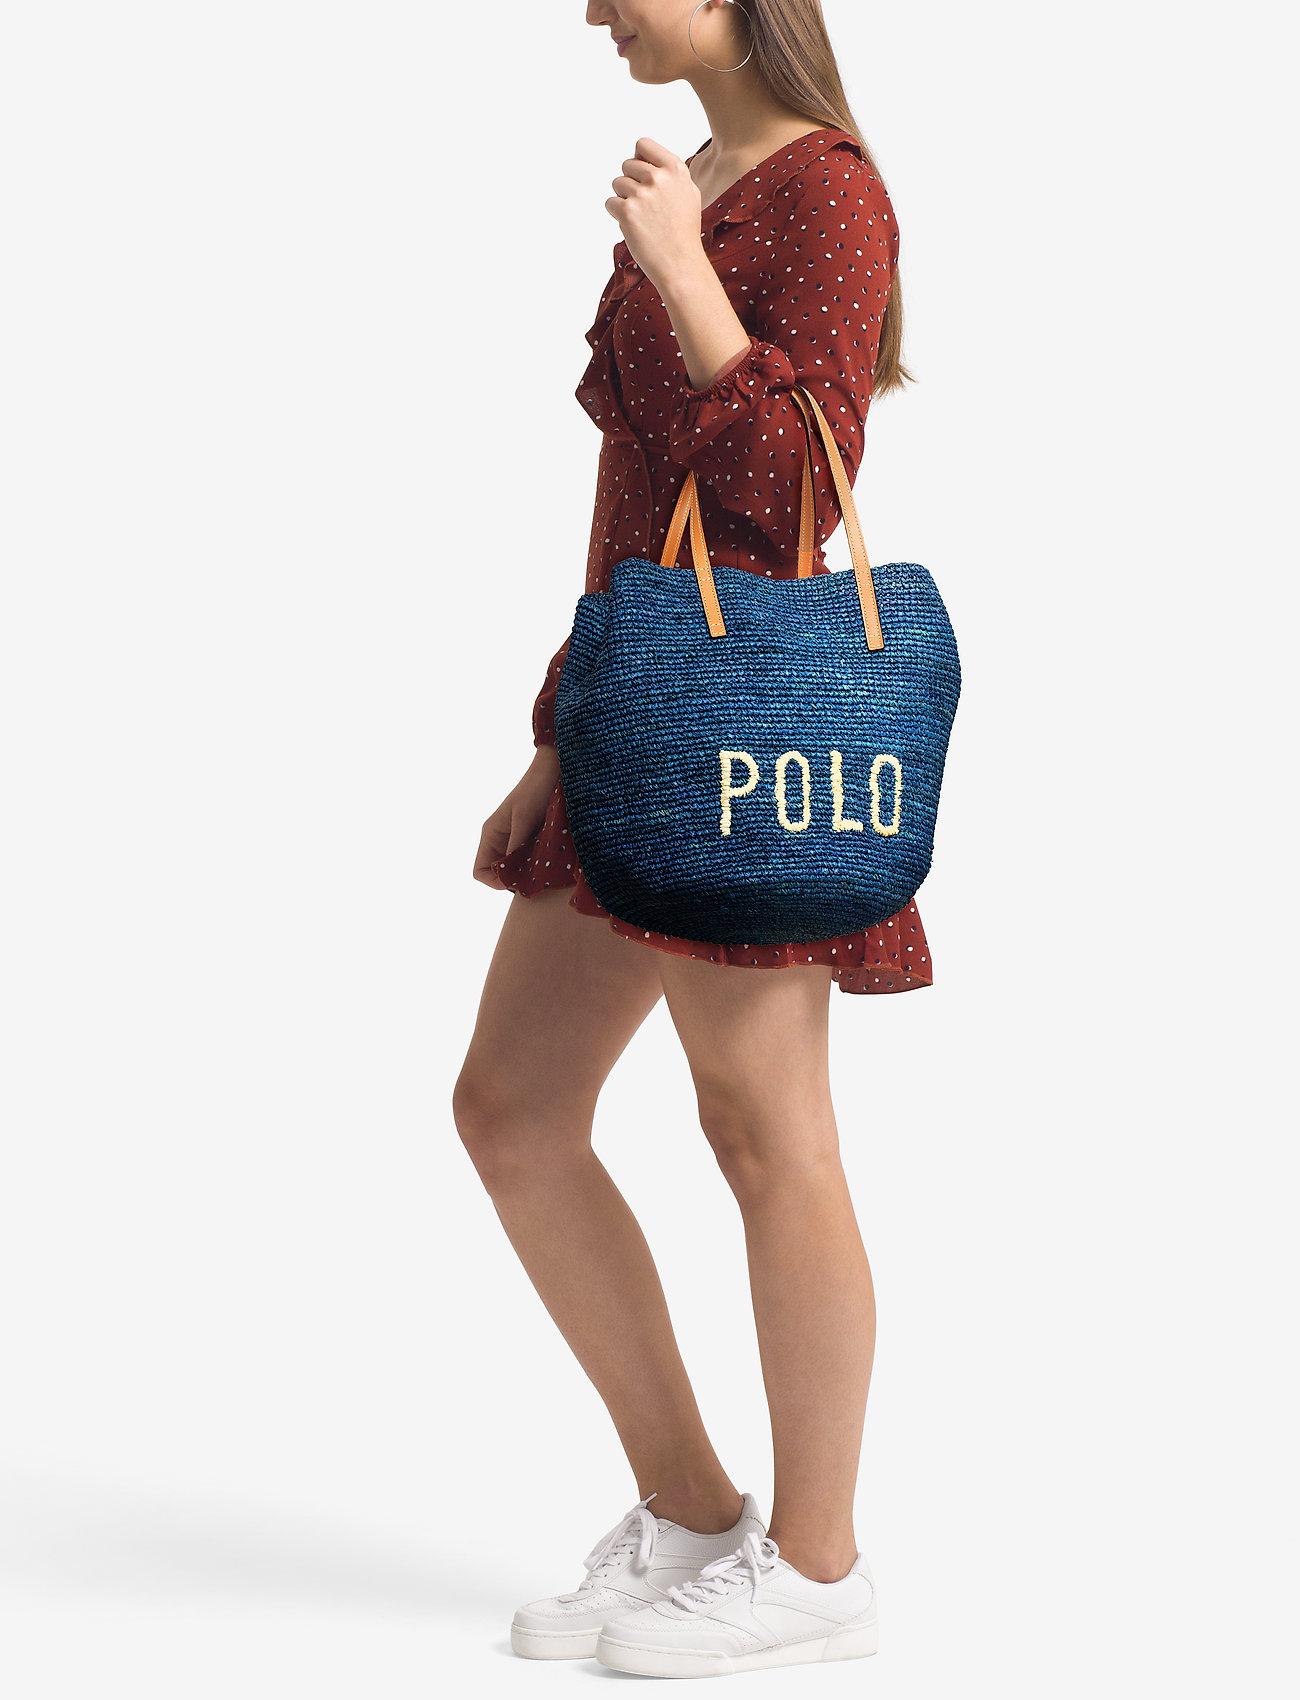 Polo Ralph Lauren Polo Raffia Large Tote Bag